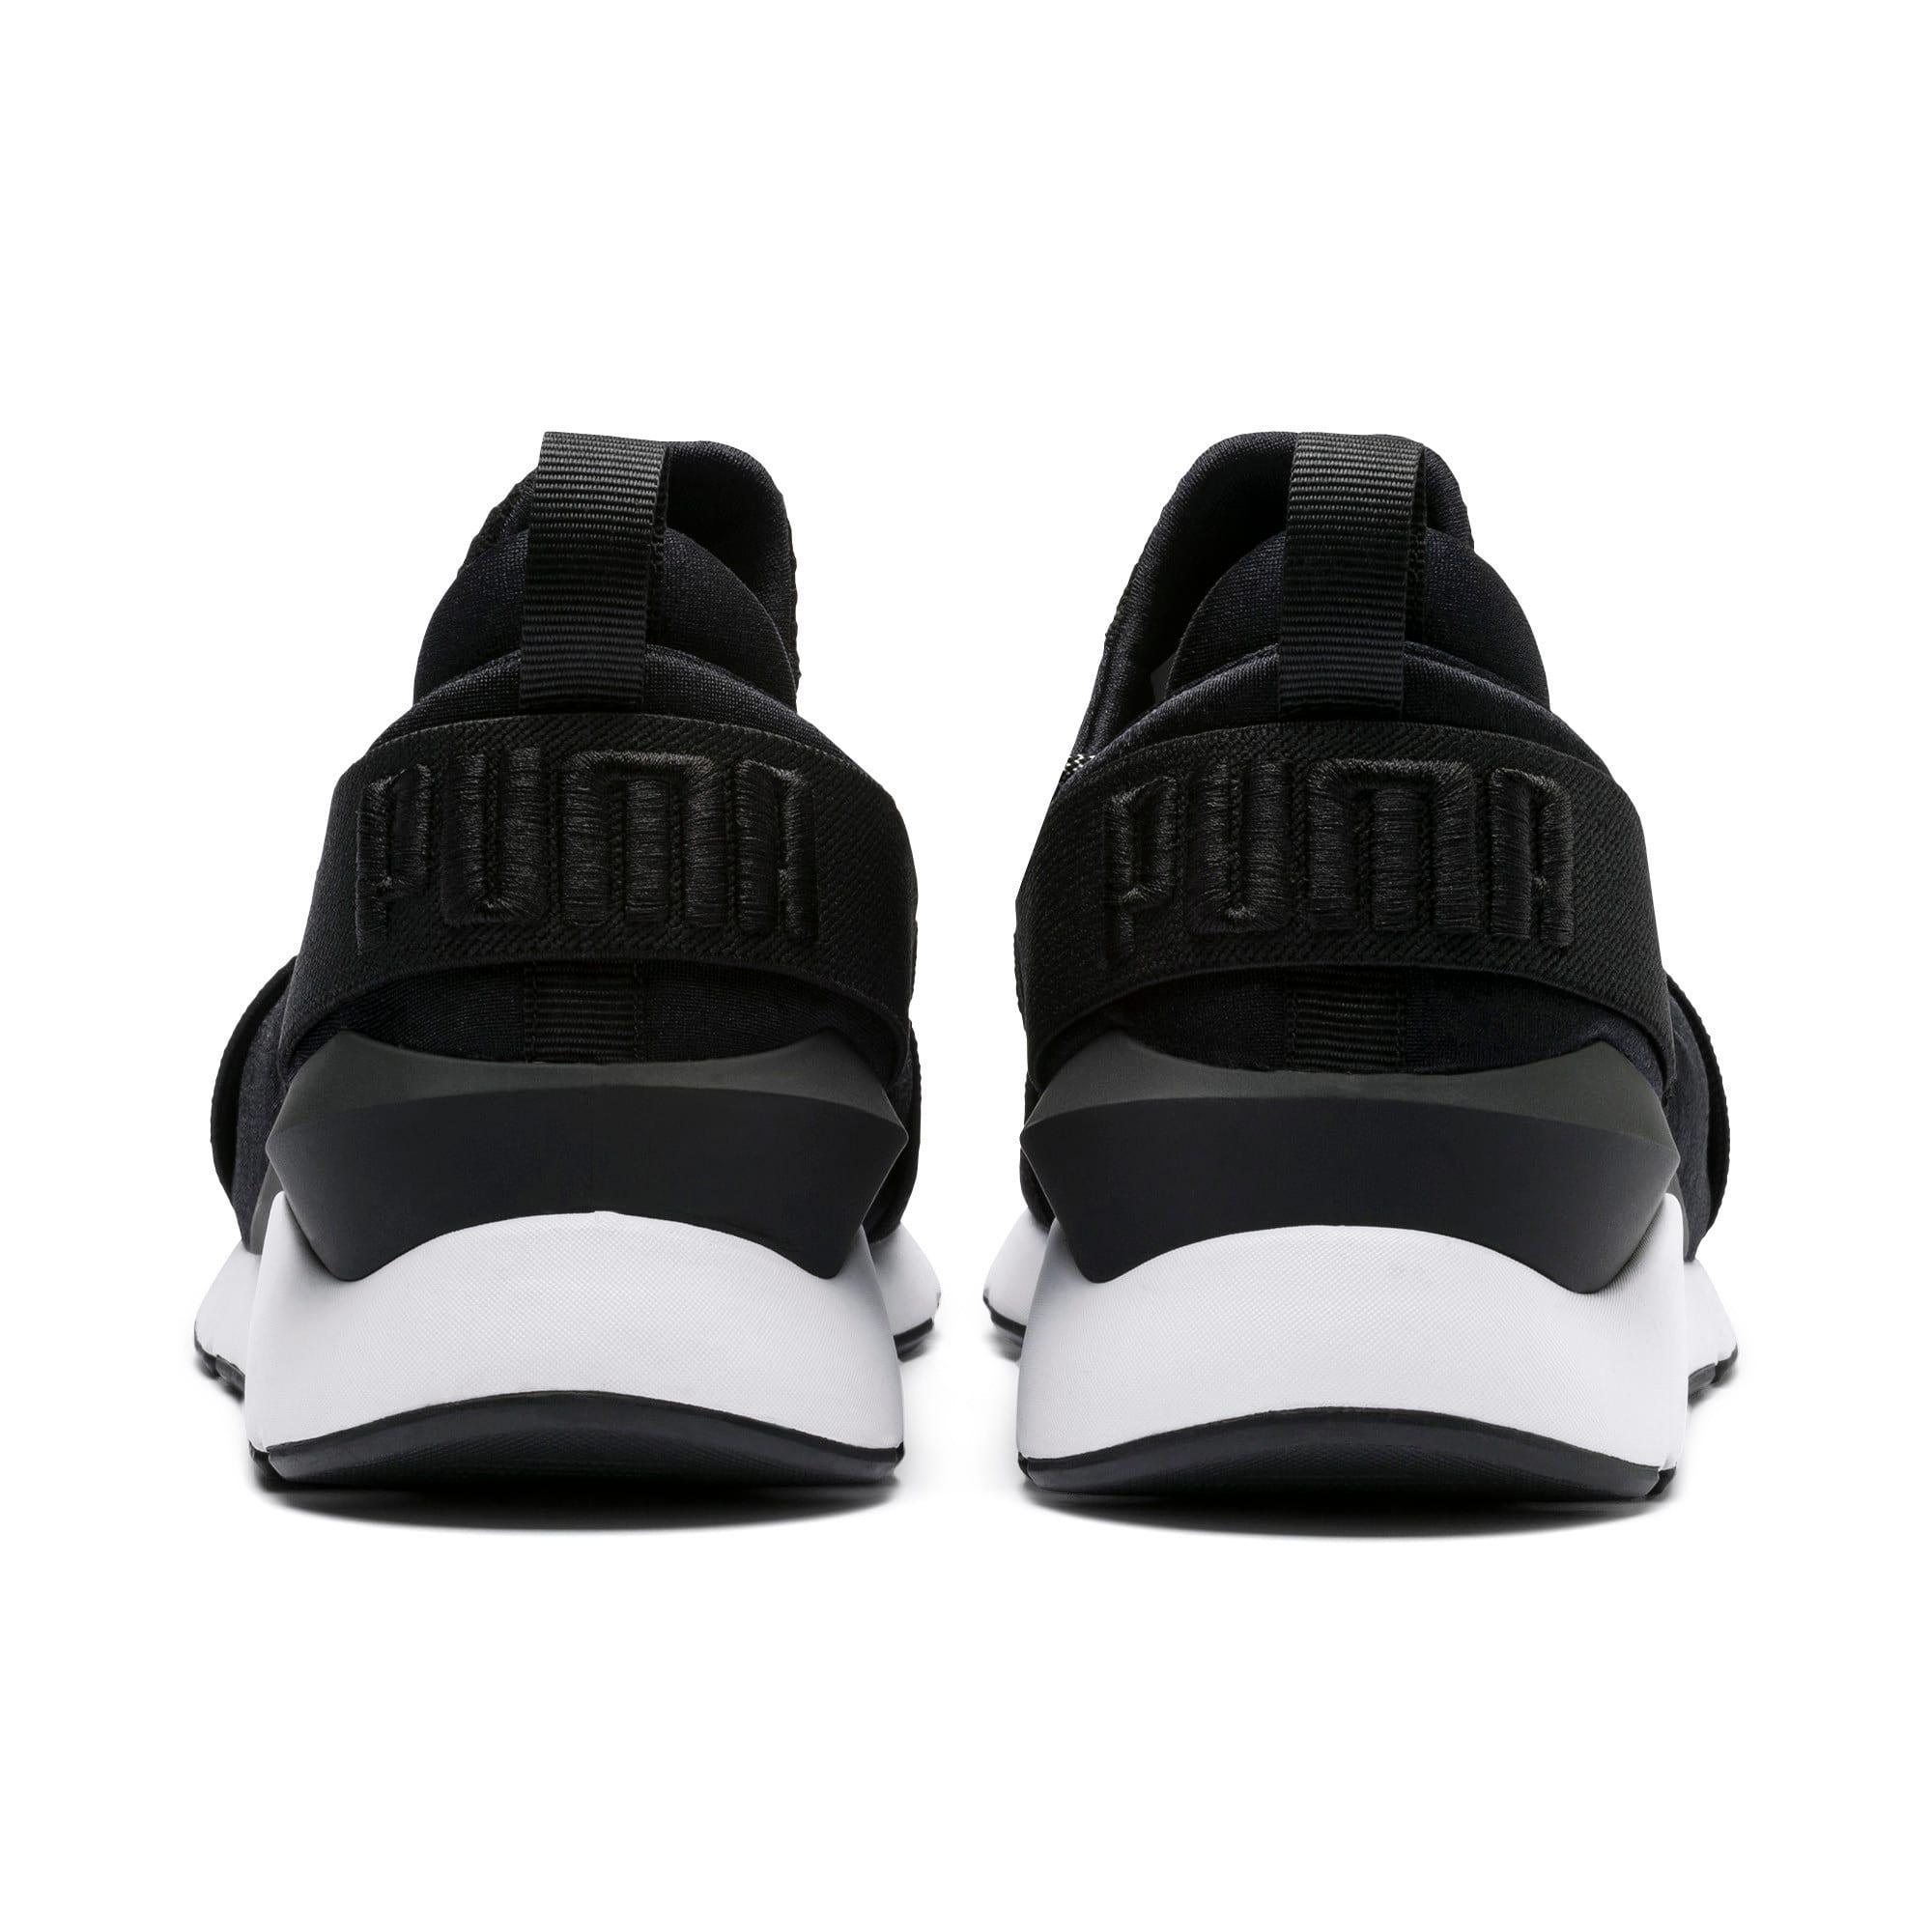 Thumbnail 3 of En Pointe Muse Satin Women's Sneakers, Puma Black-Puma White, medium